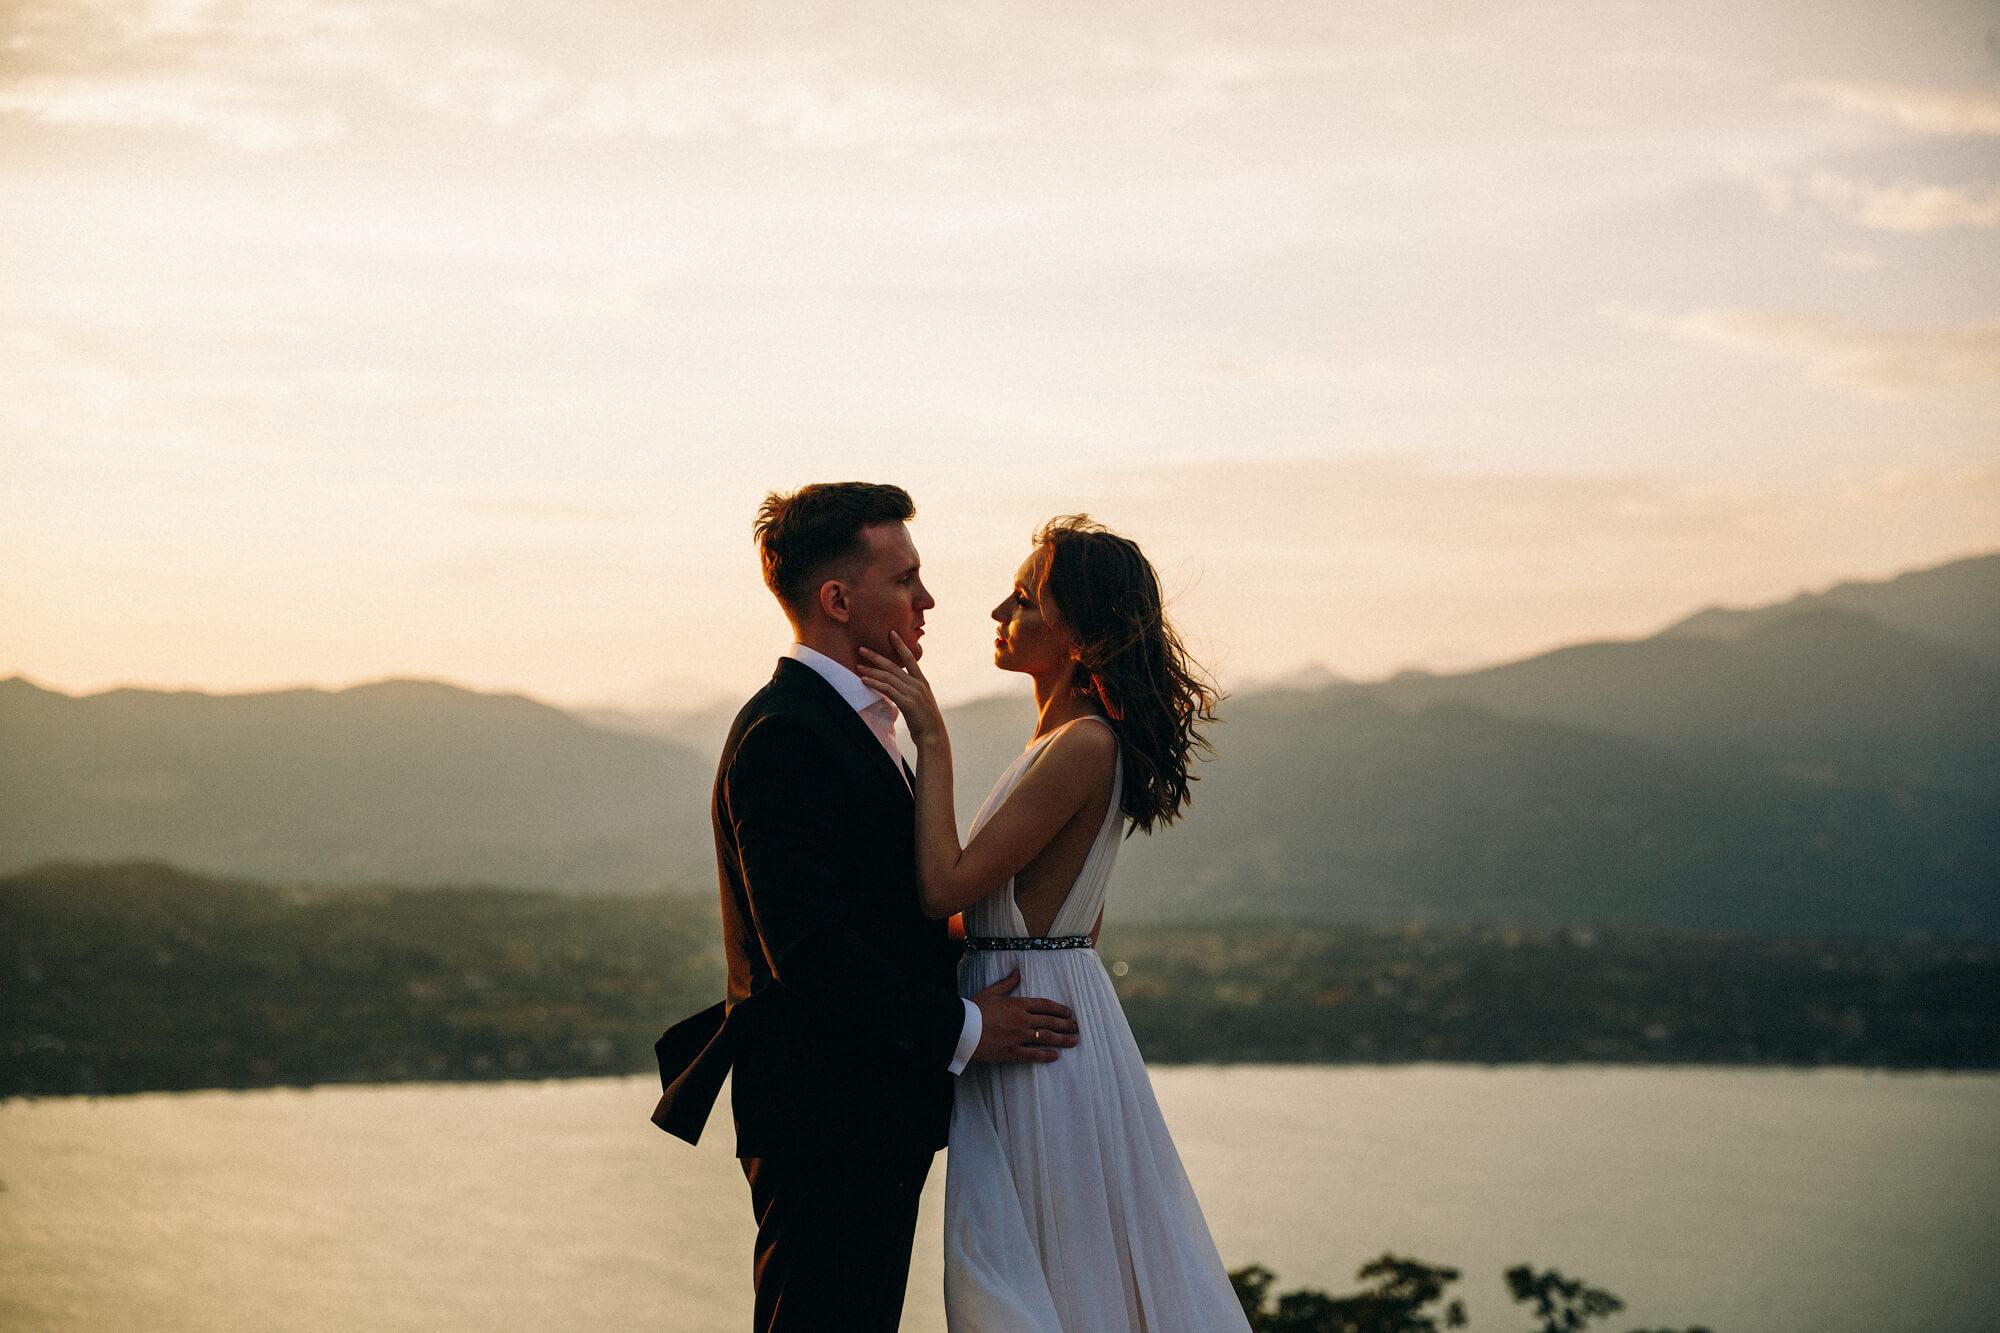 Свадьба в Италии. Организация свадьбы в Италии. BM Weddings & Events